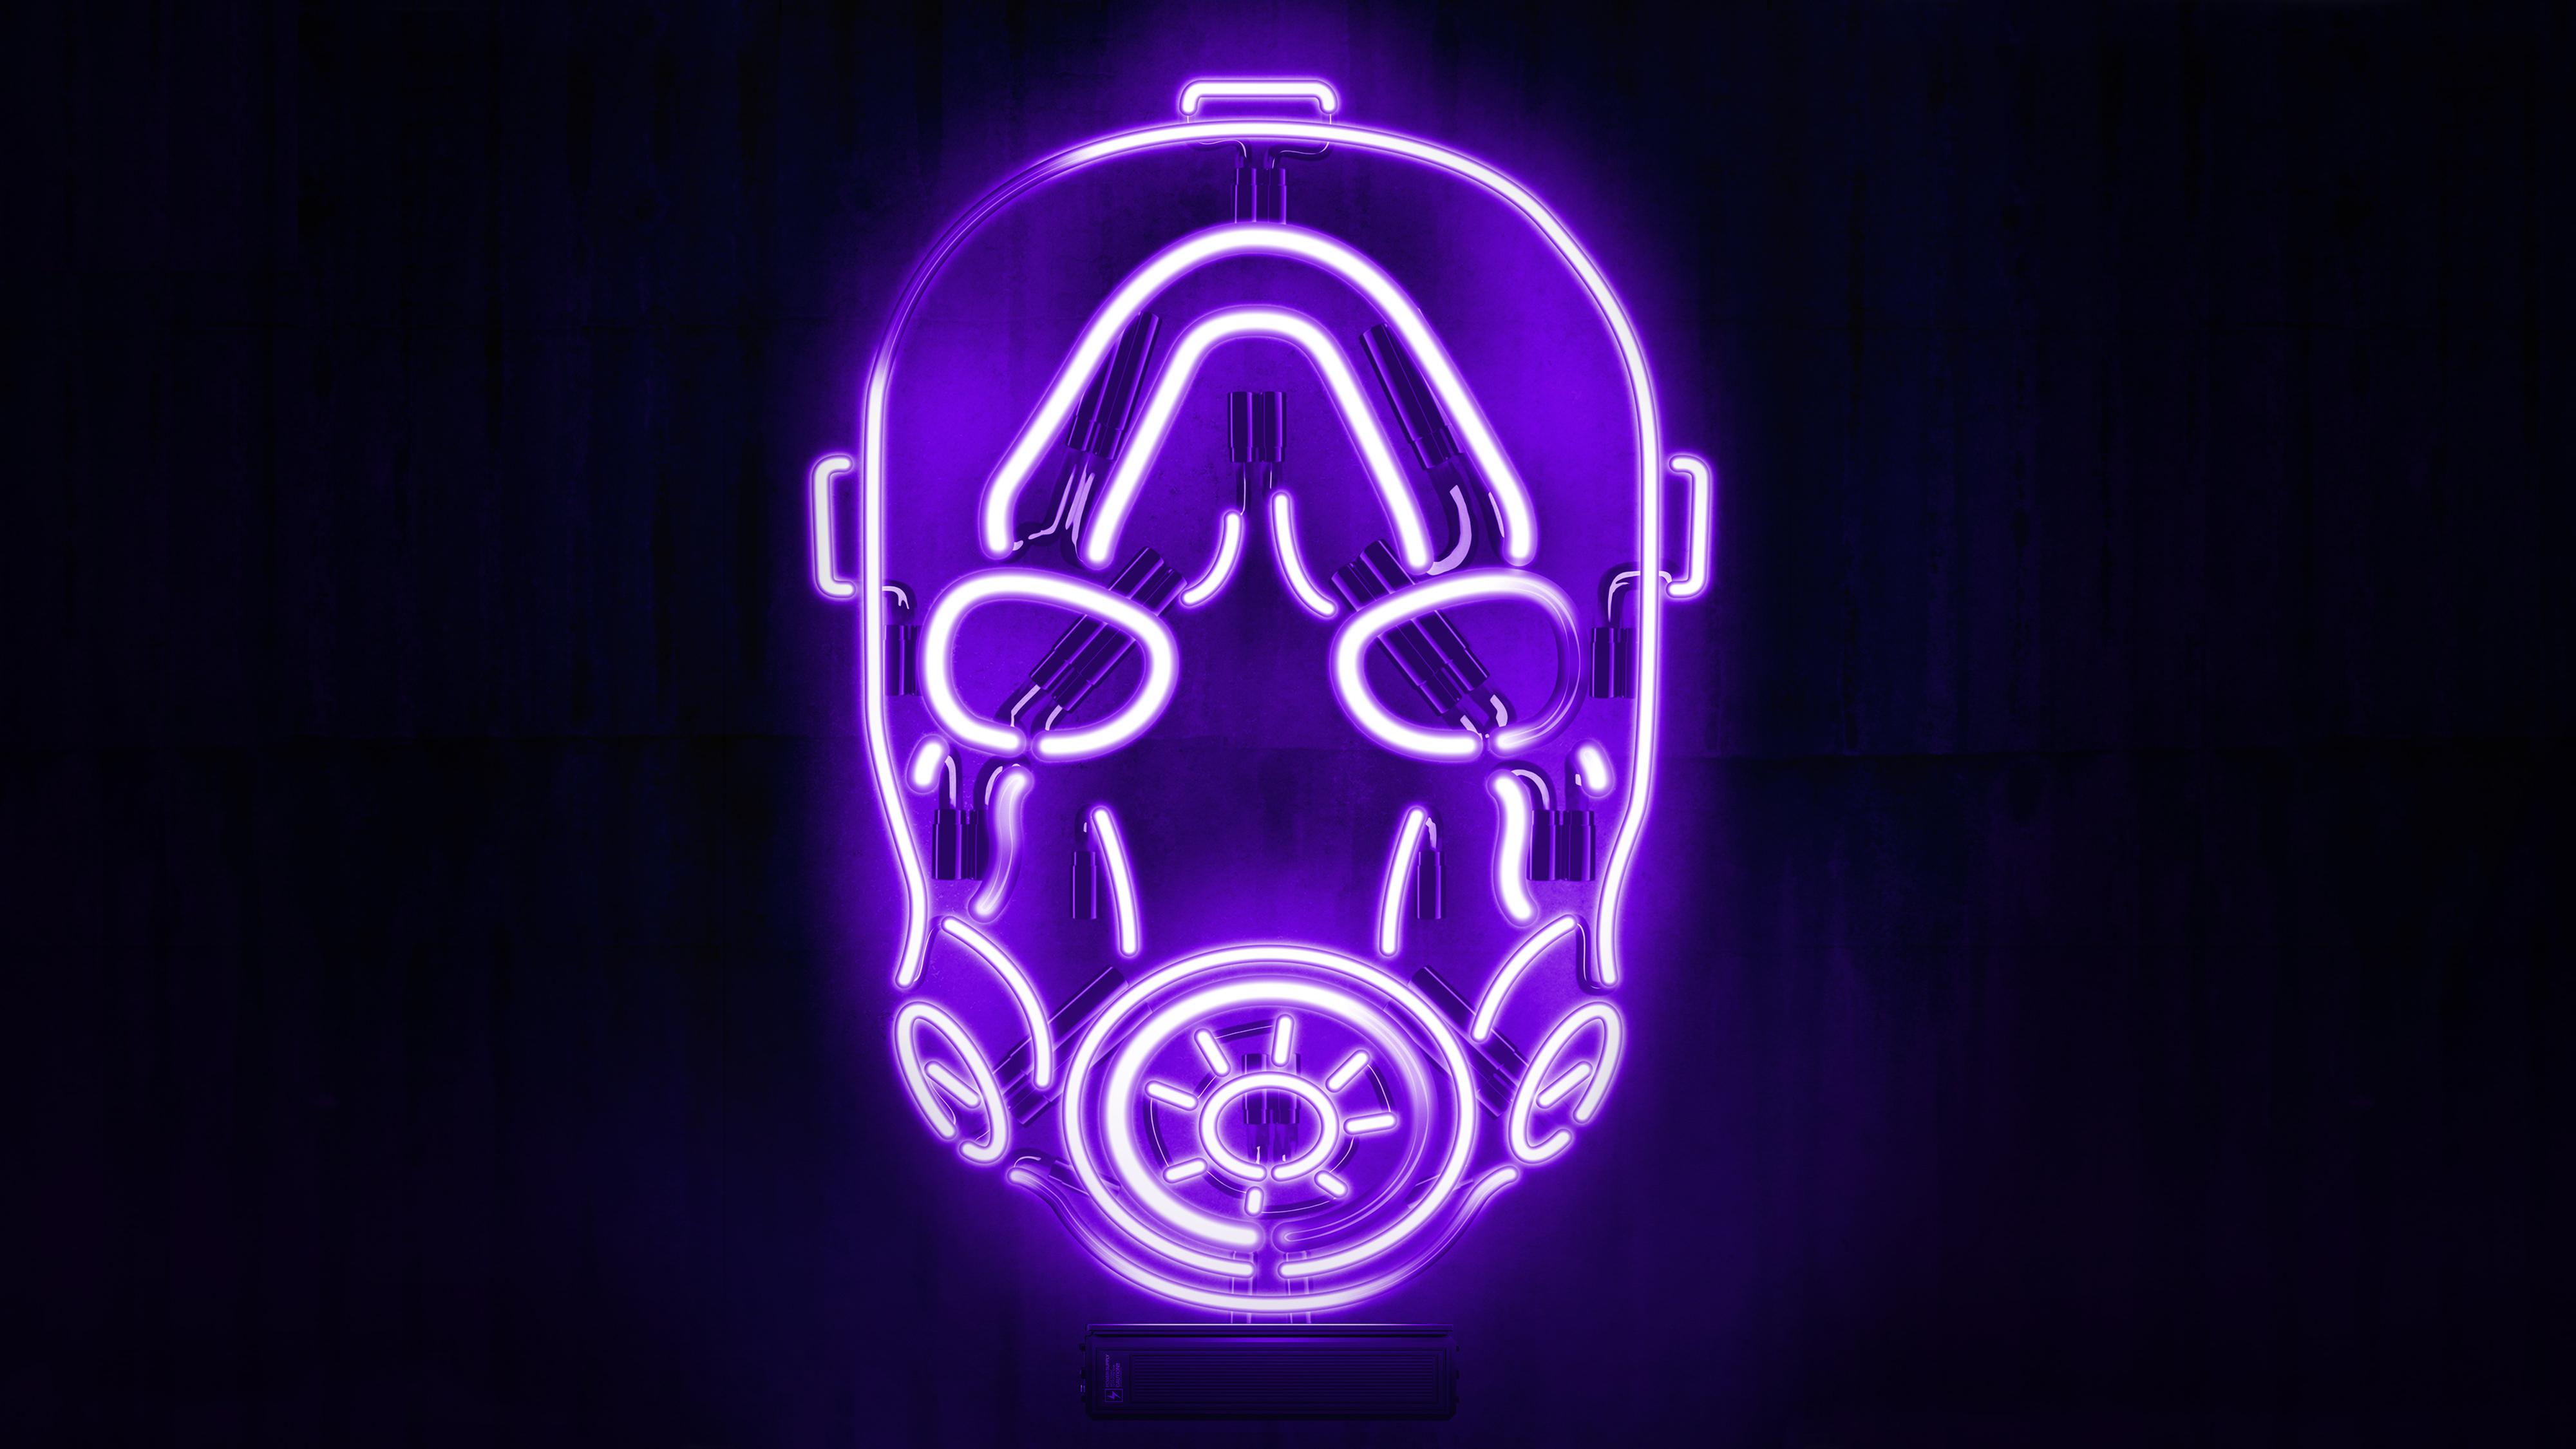 borderlands psycho mask neon black background 4000x2250 492